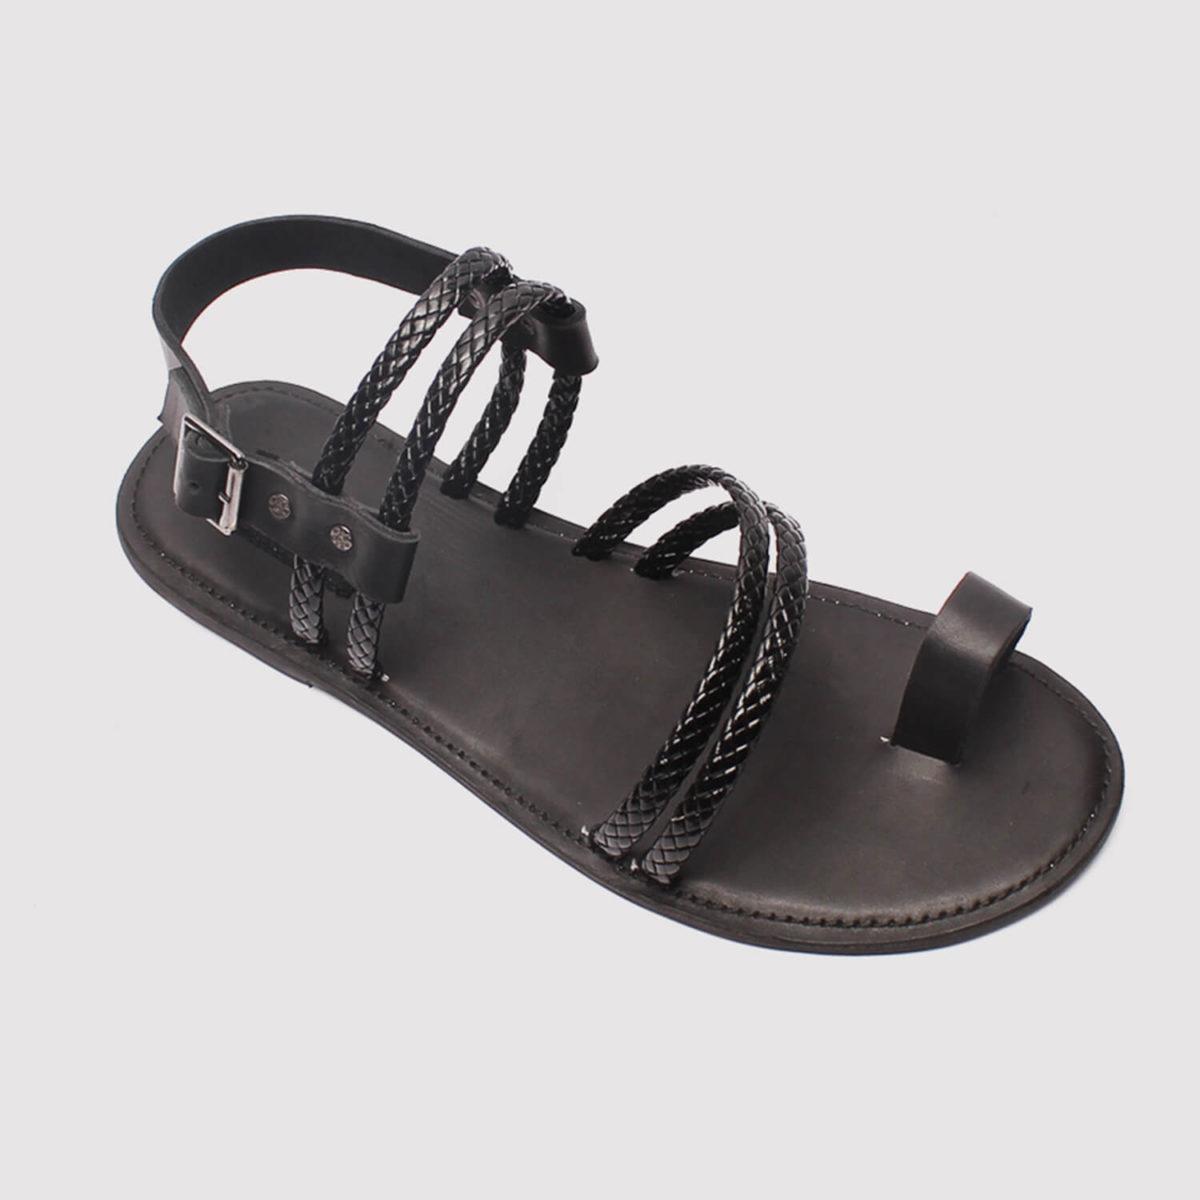 morsi black leather sandals zorkle shoes in lagos nigeria